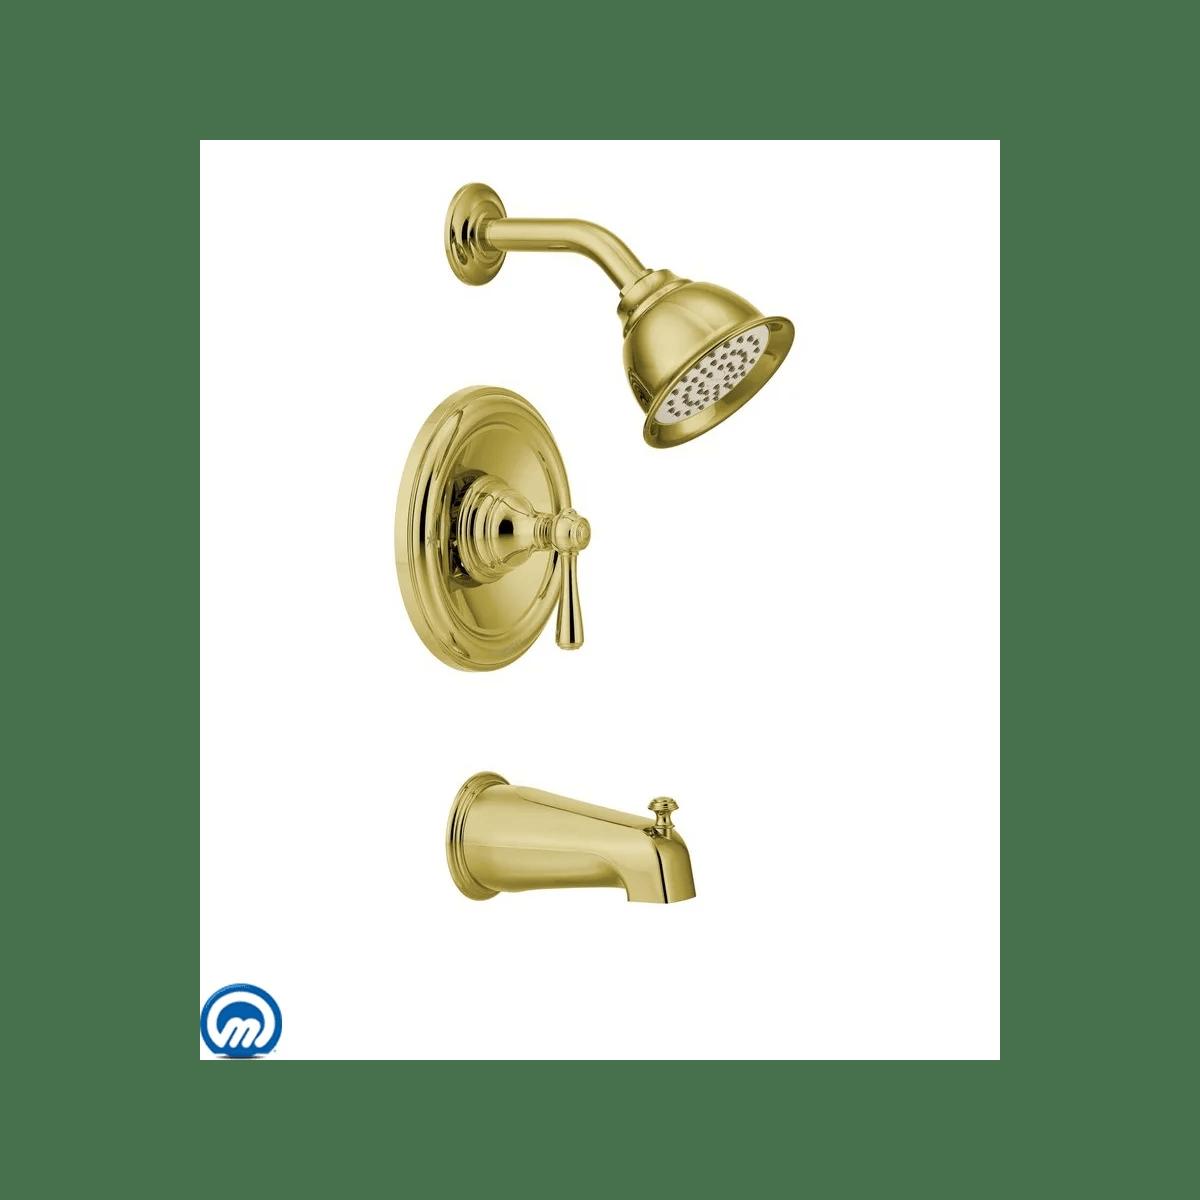 Moen T2113p Polished Brass Single Handle Posi Temp Pressure